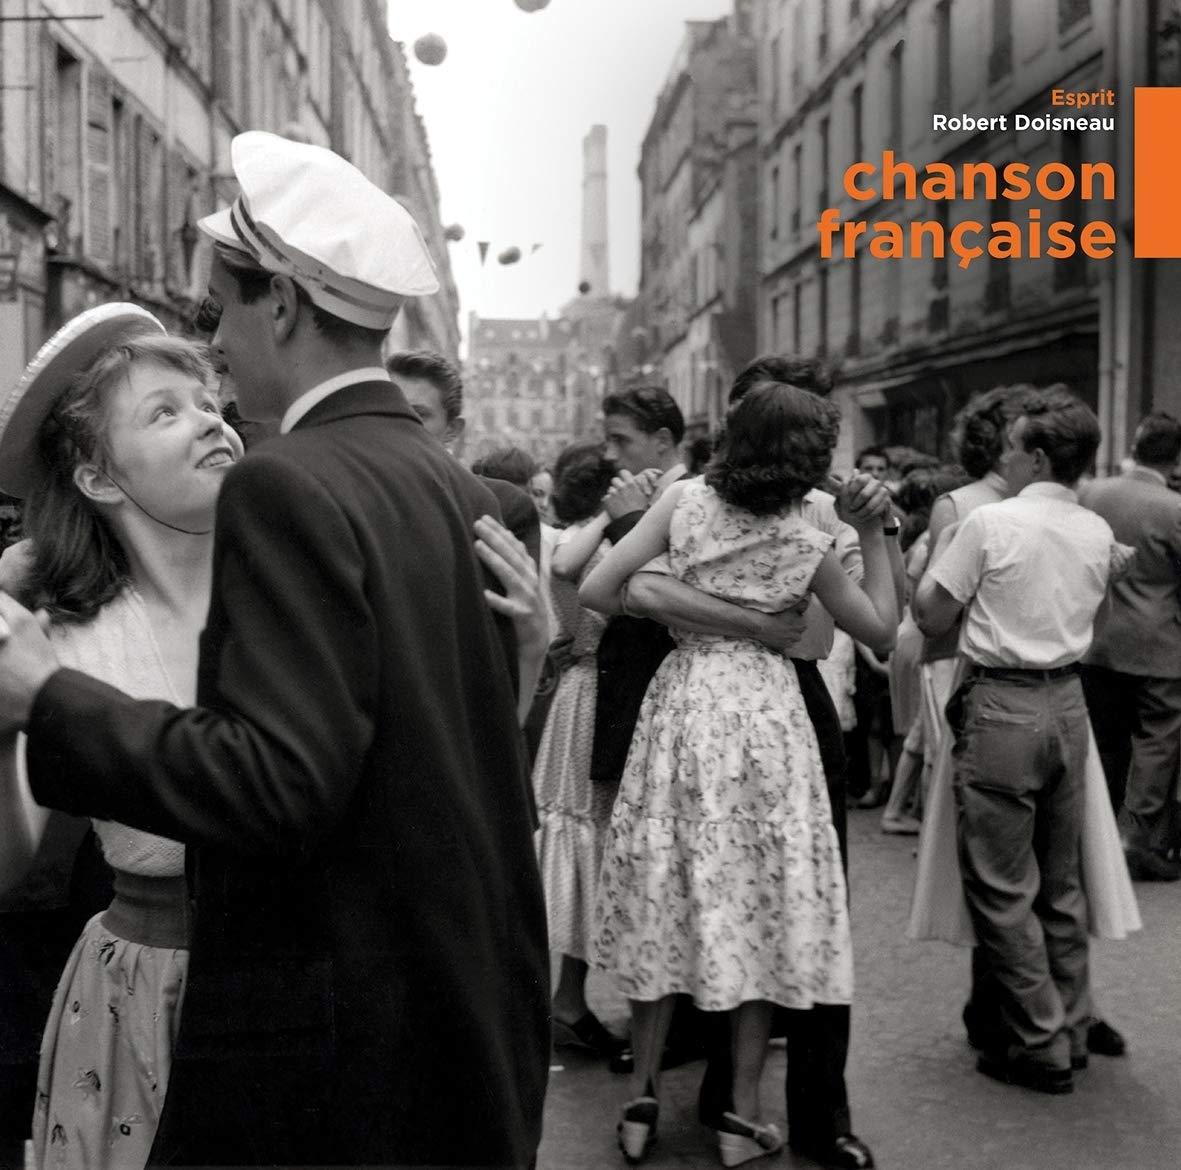 CHANSON FRANAISE [VINYL]